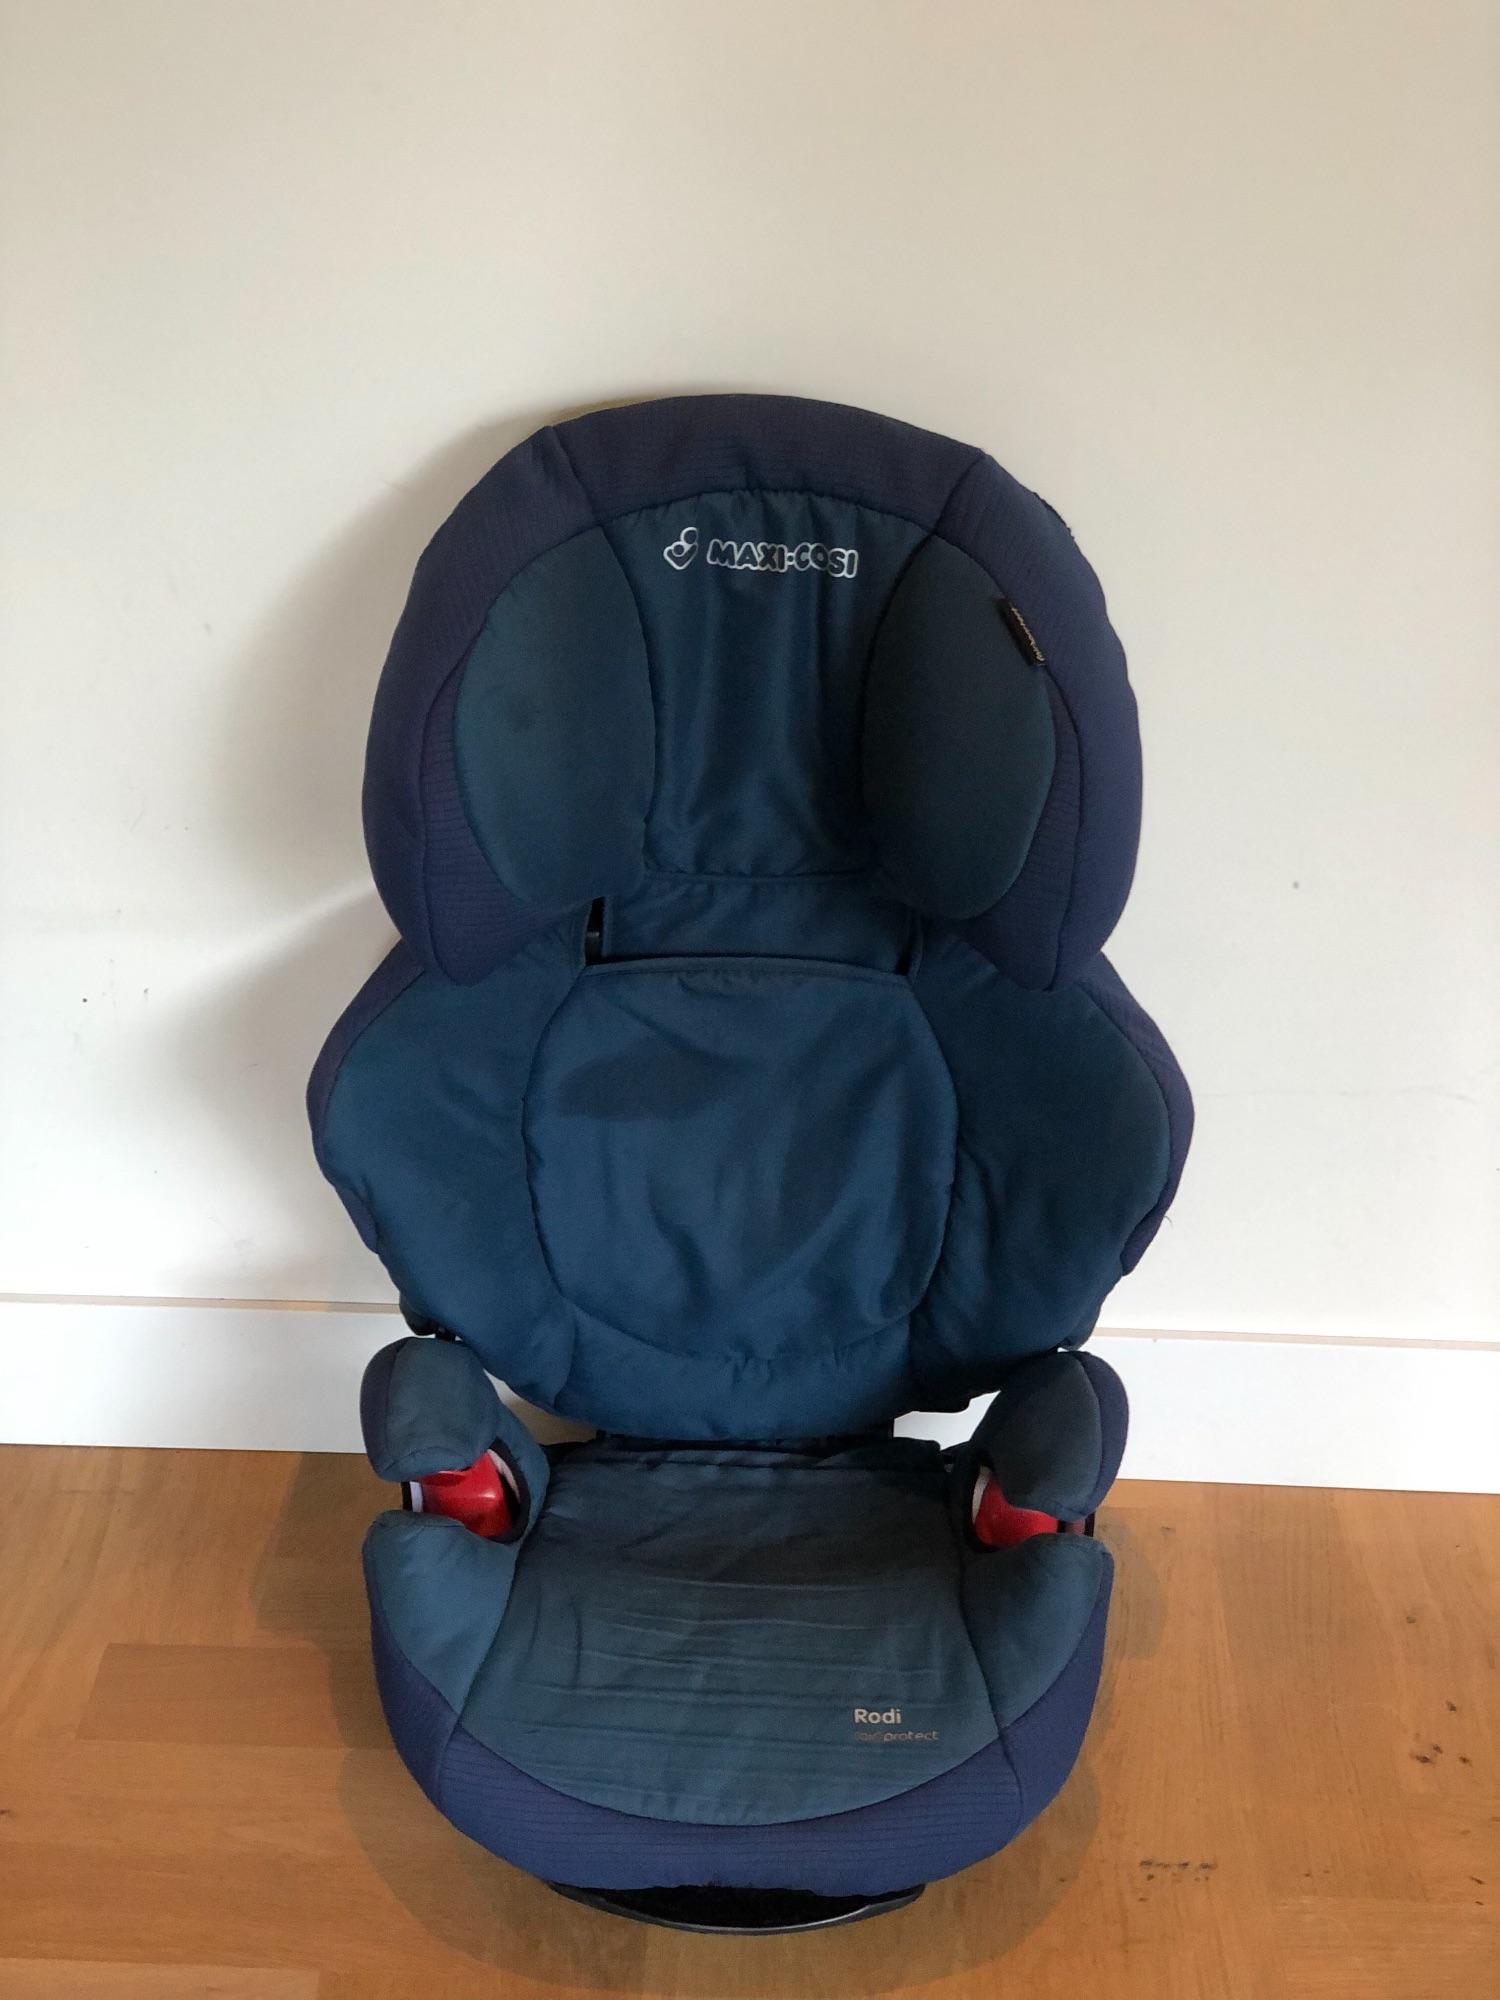 Maxi Cosi Rodi autostoel